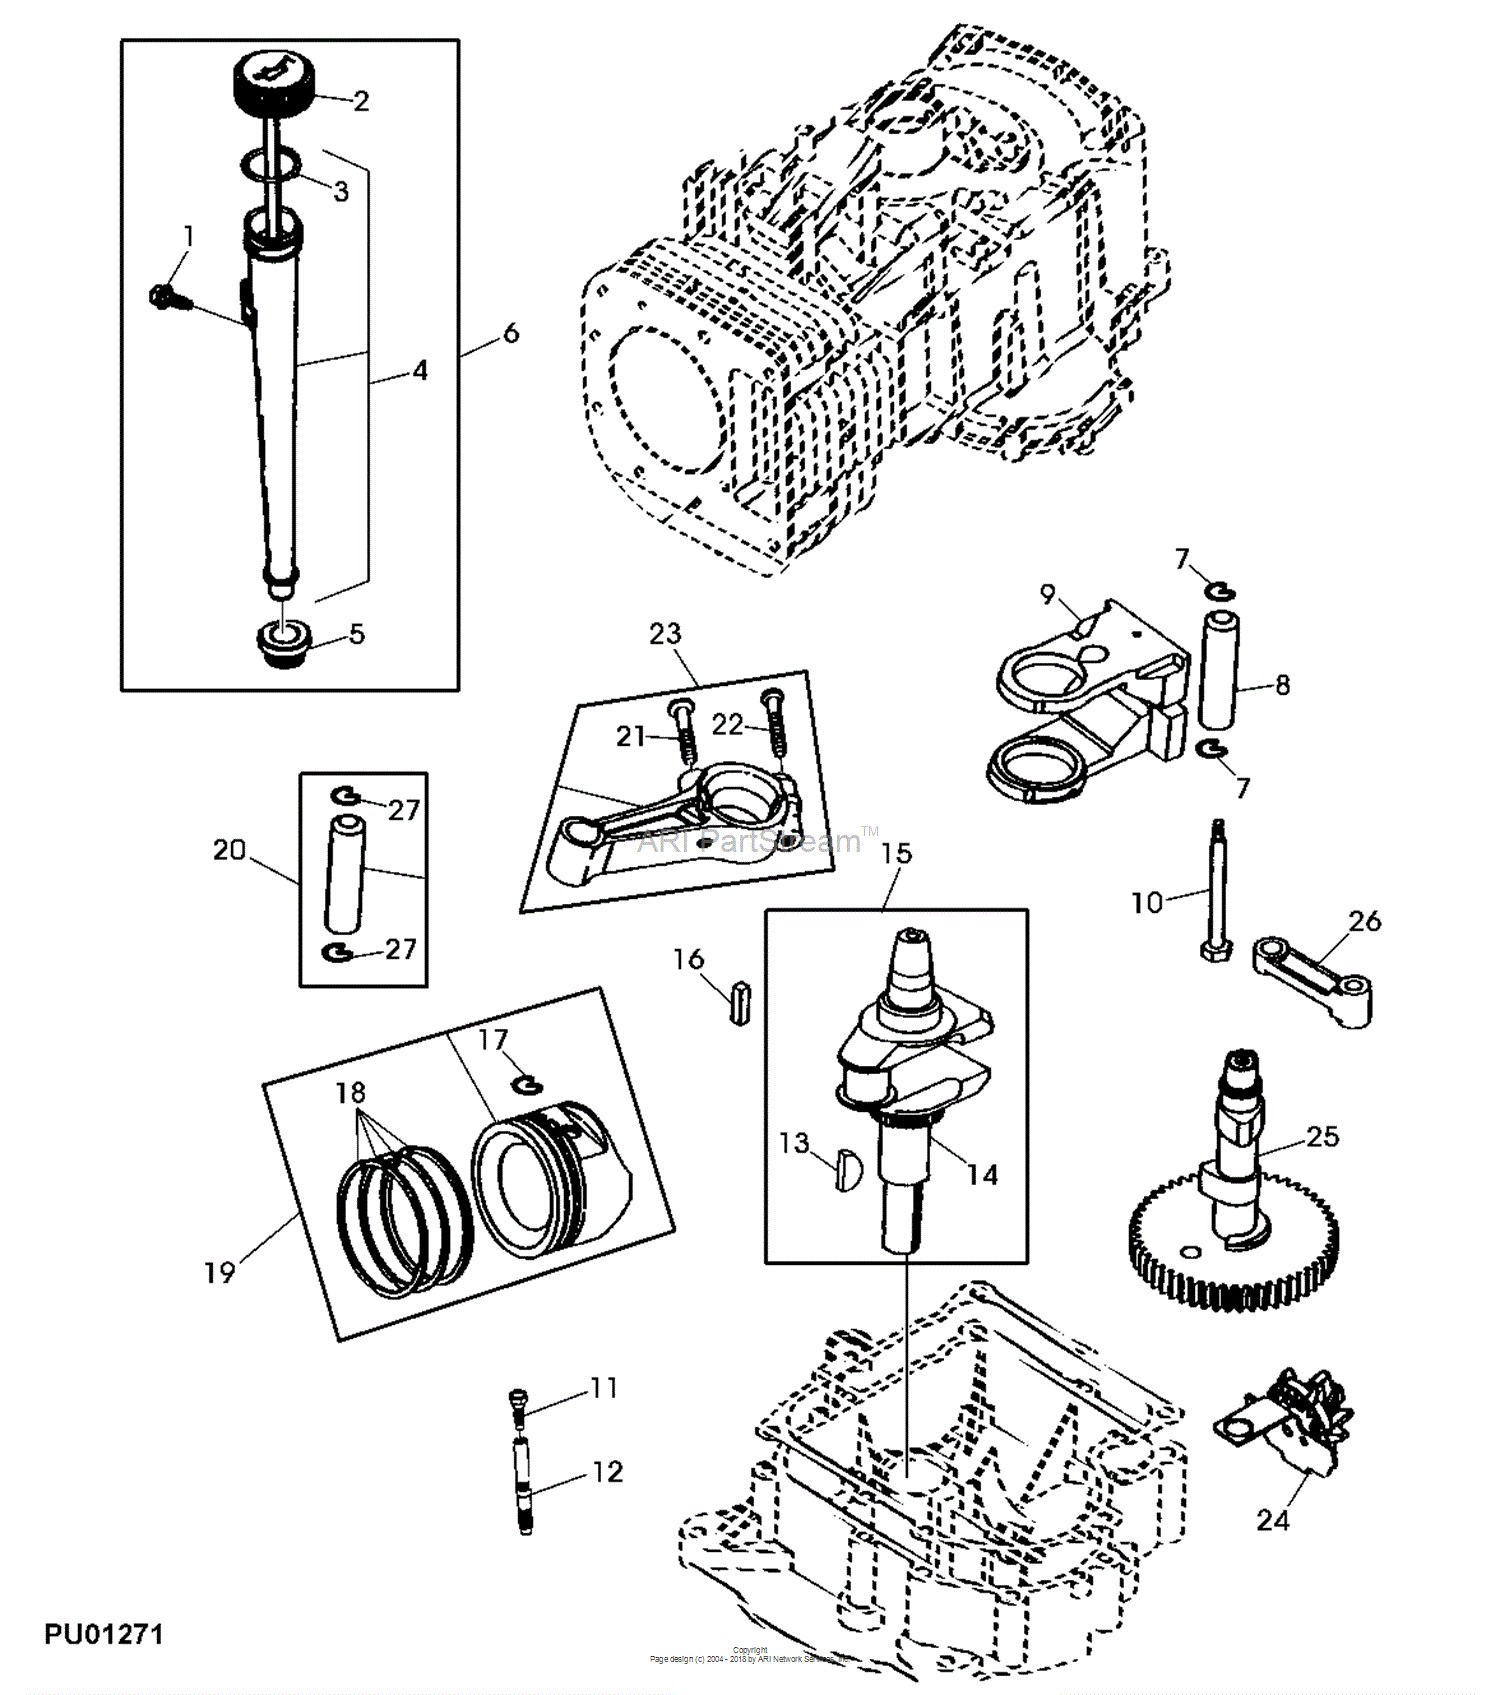 Piston Parts Diagram John Deere Parts Diagrams John Deere Sabre 1438 Lawn Tractor